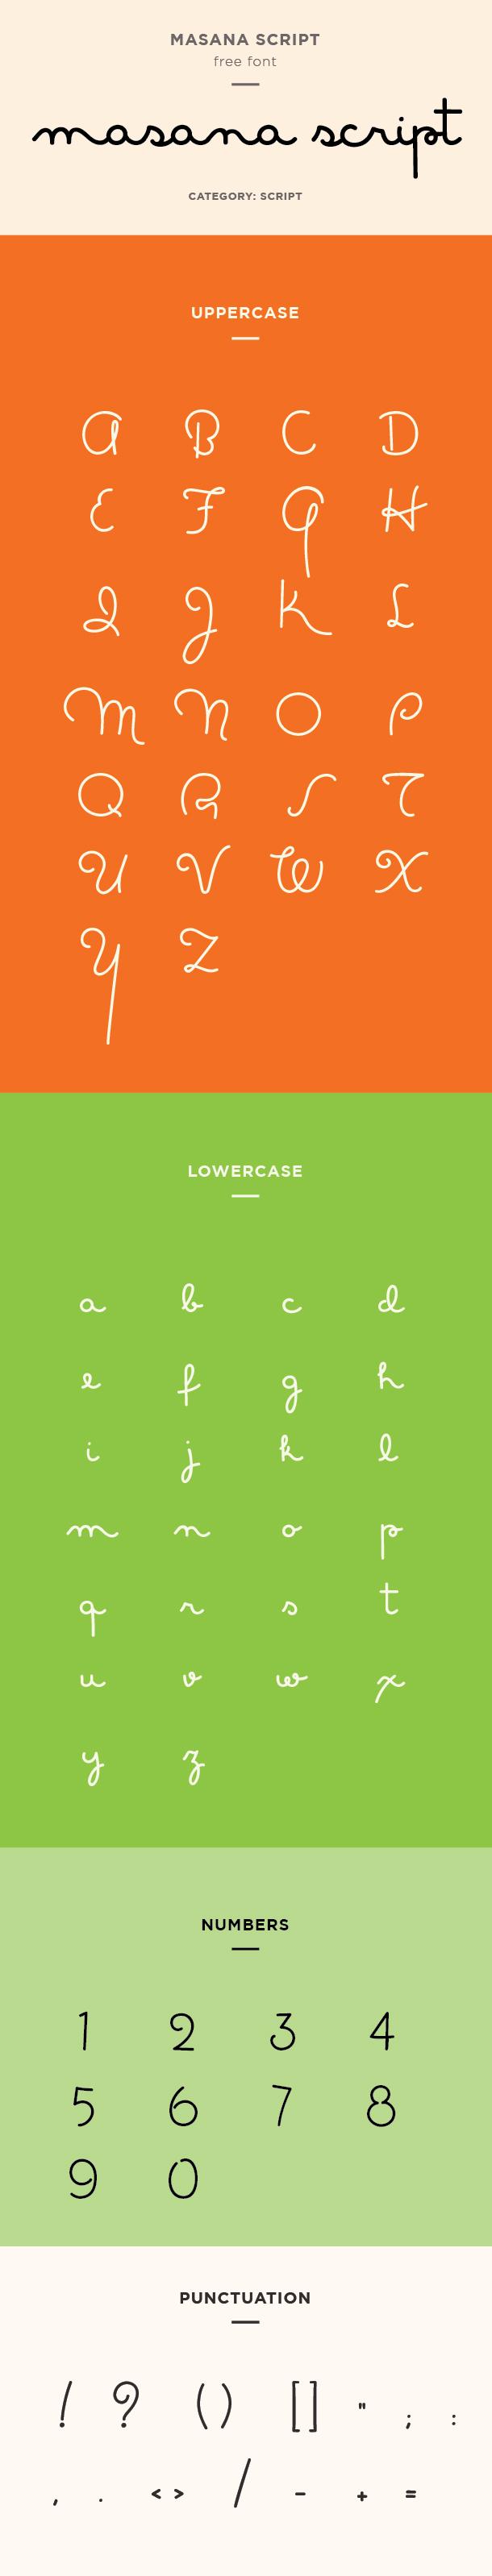 Masana script font — click here for free download.